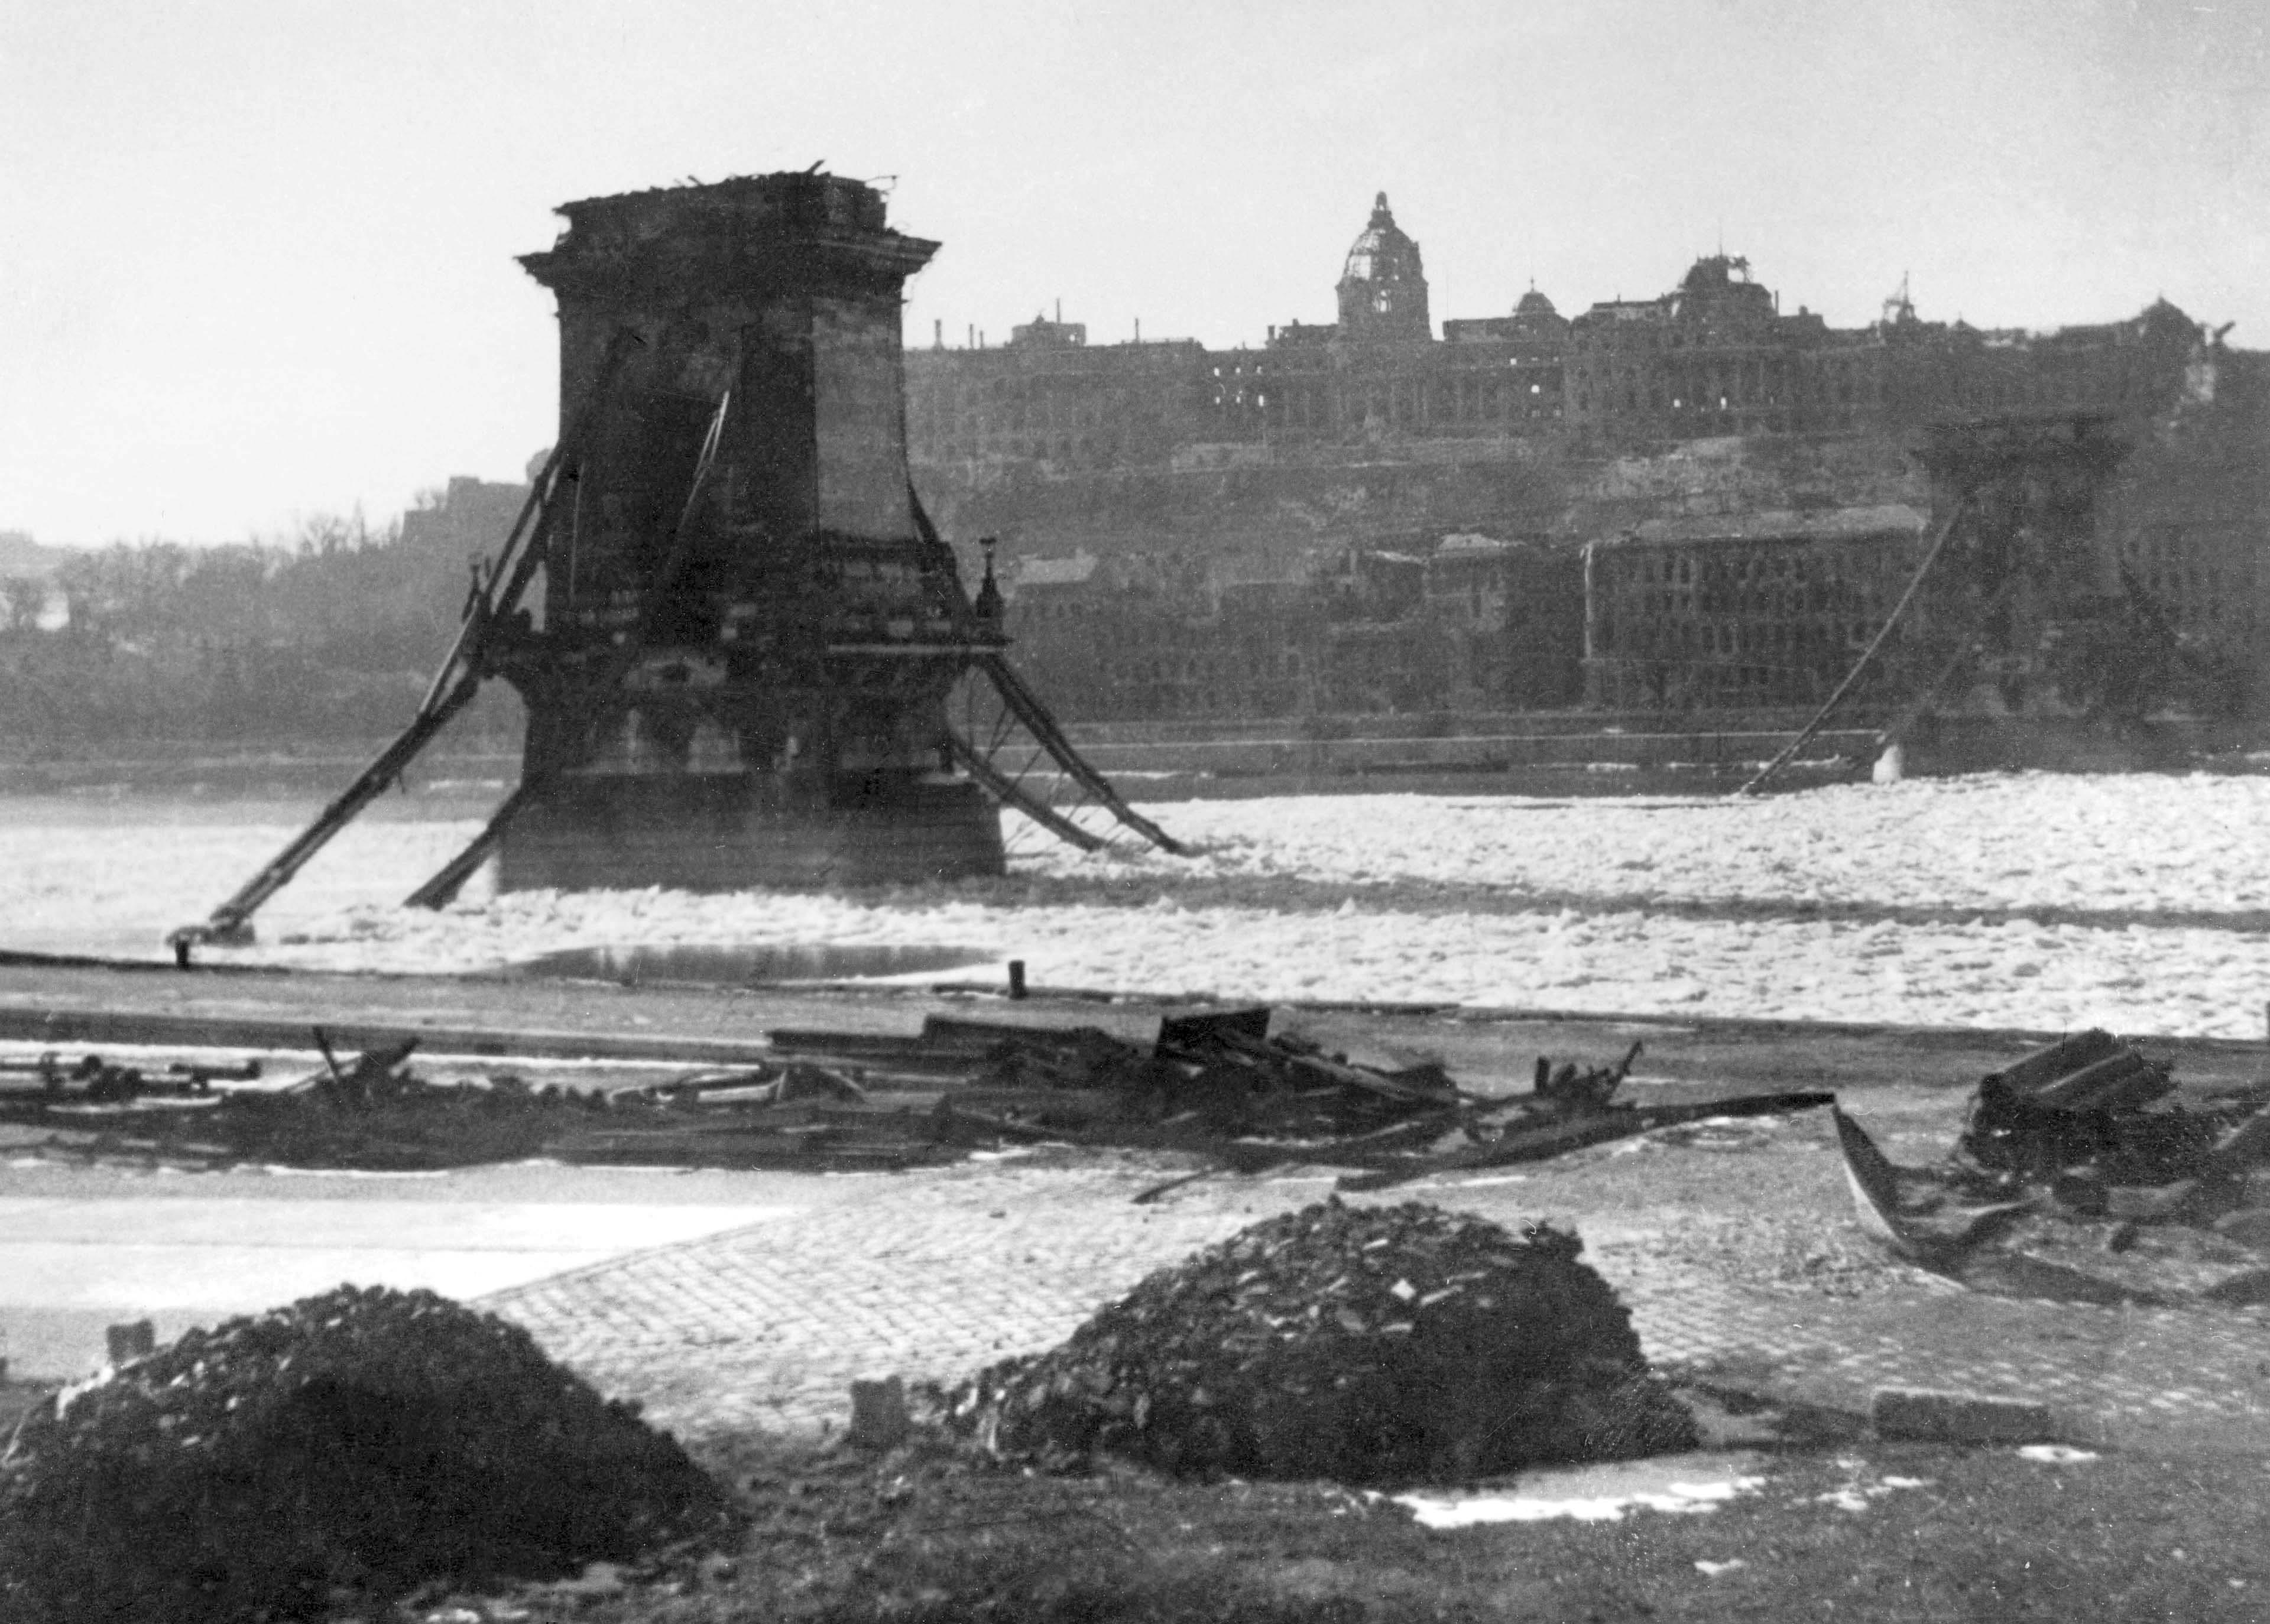 Будапешт, 1945. Разрушенный цепной мост. Источник https://upload.wikimedia.org/